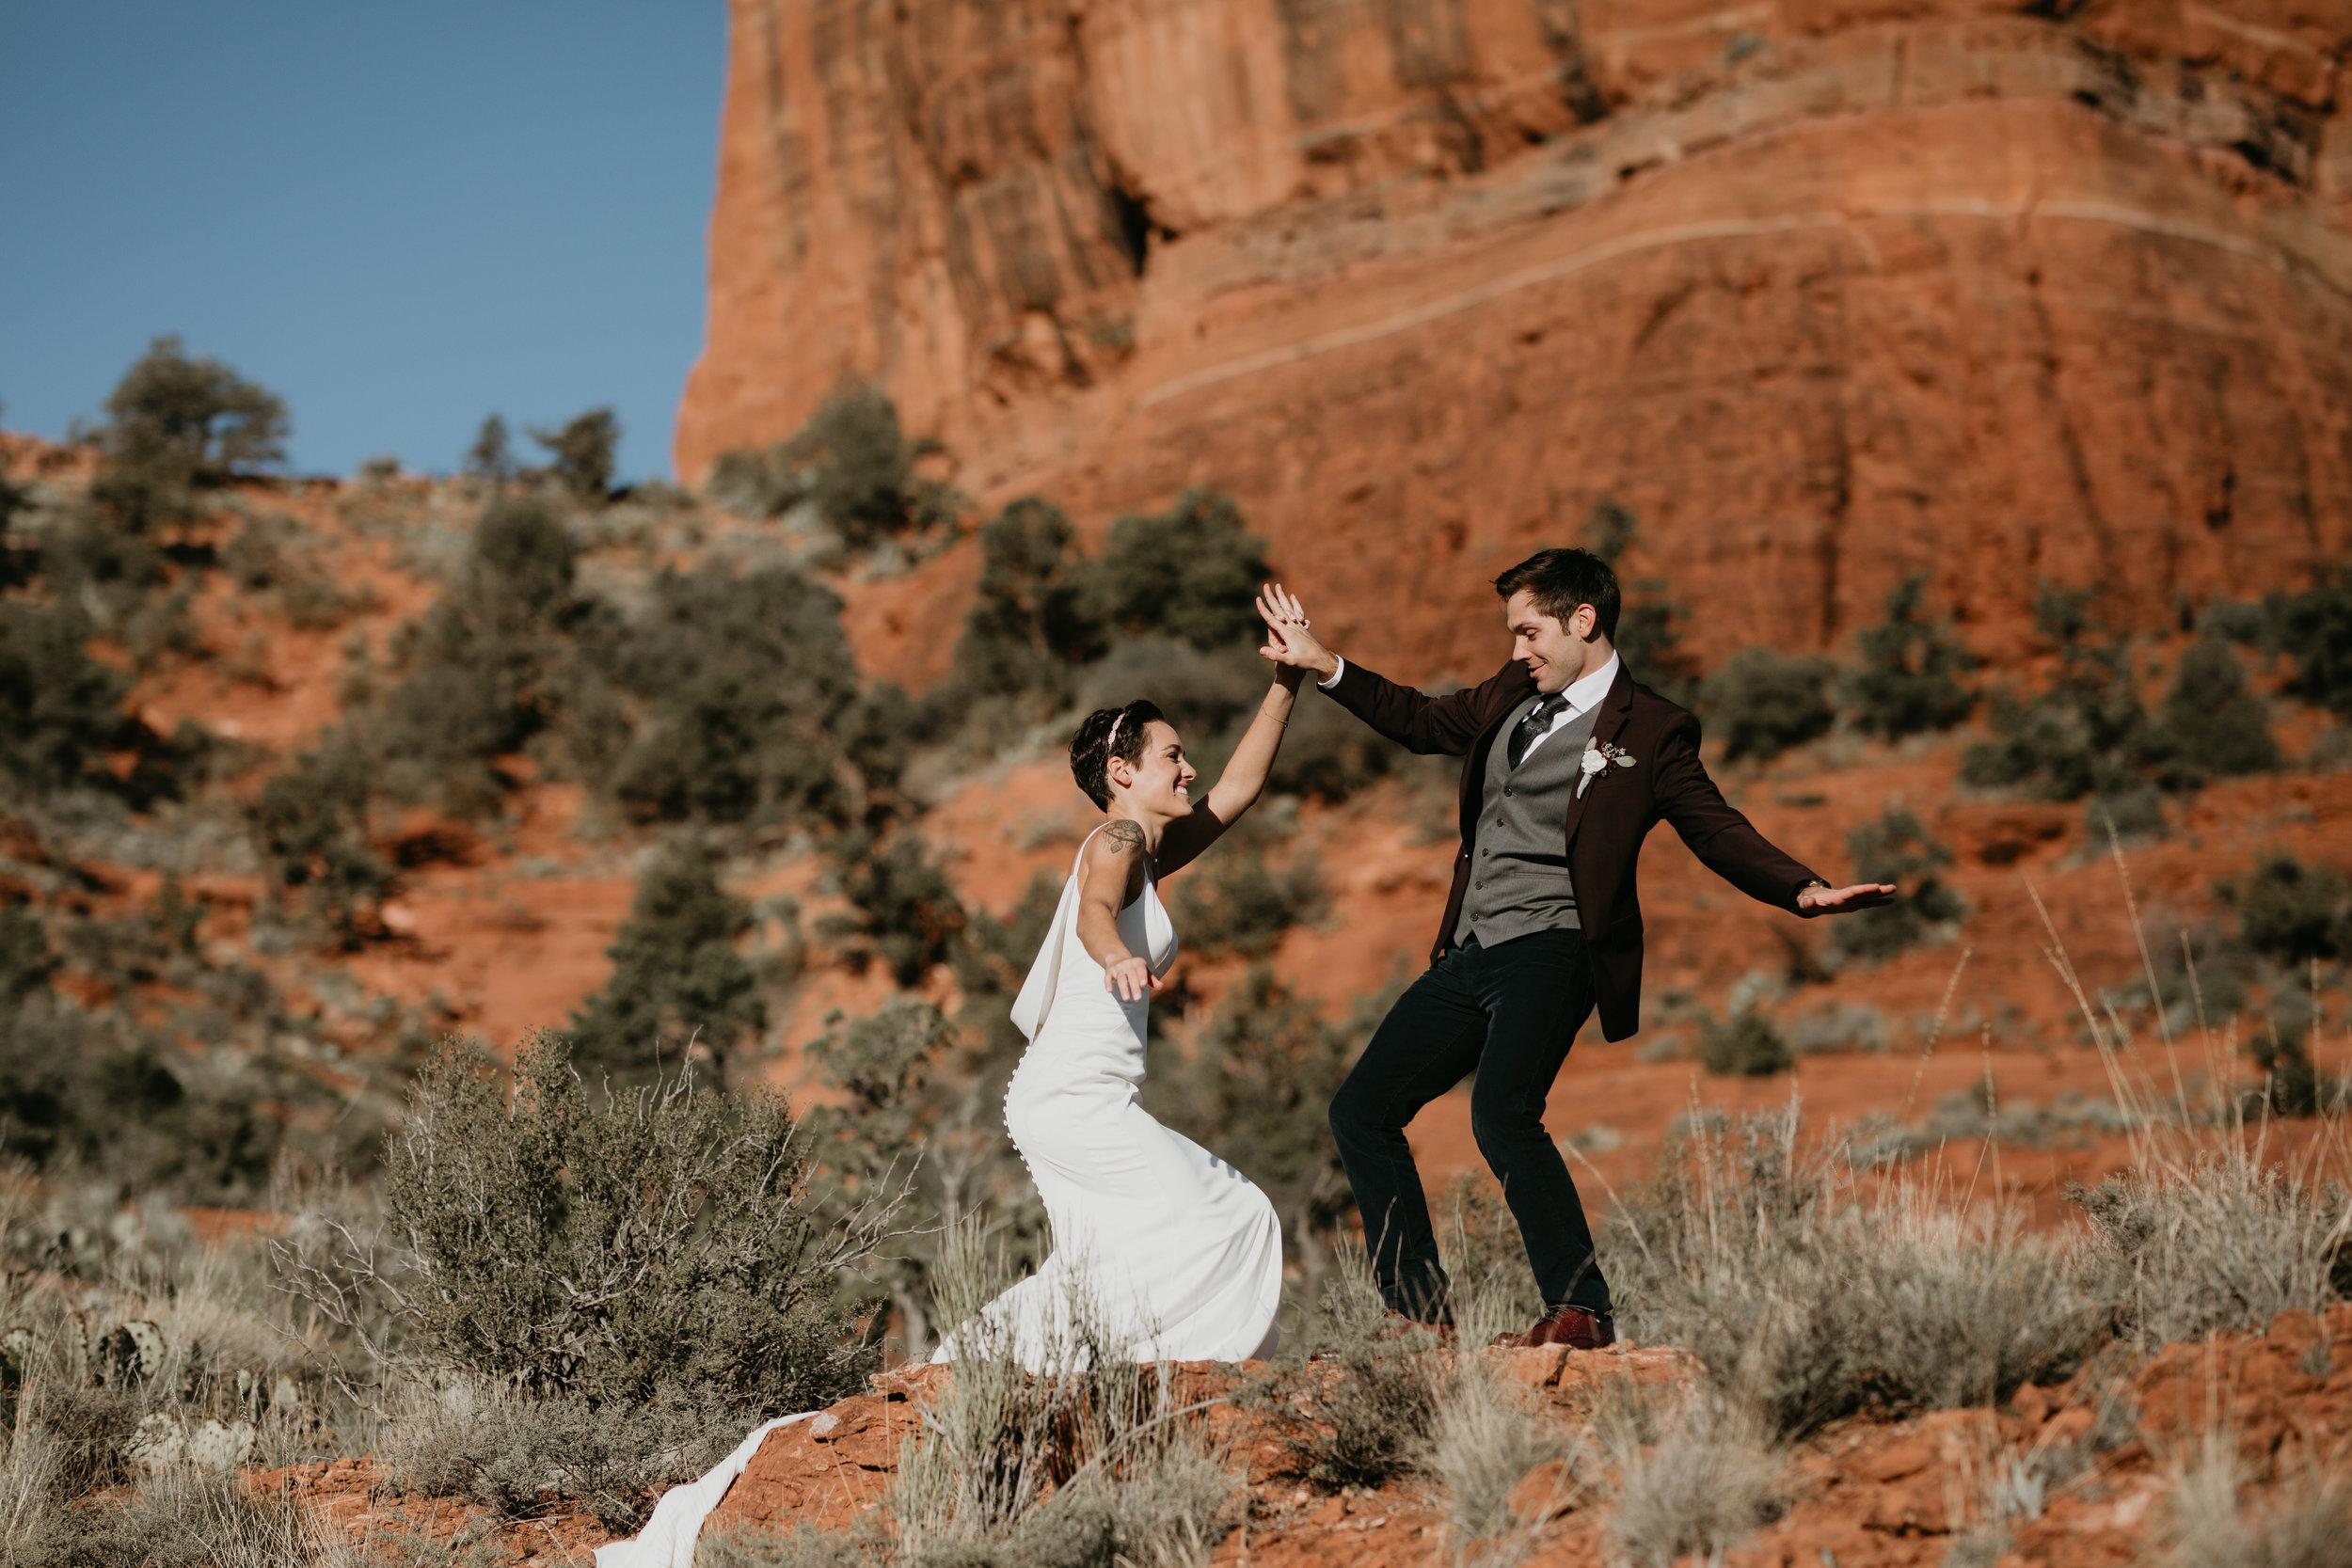 nicole-daacke-photography-sedona-arizona-destination-elopement-wedding-photographer-catherdral-rock-hiking-elopement-sedona-river-elopement-photos-desert-rock-wedding-photographer-laid-back-spontaneous-elopement-71.jpg